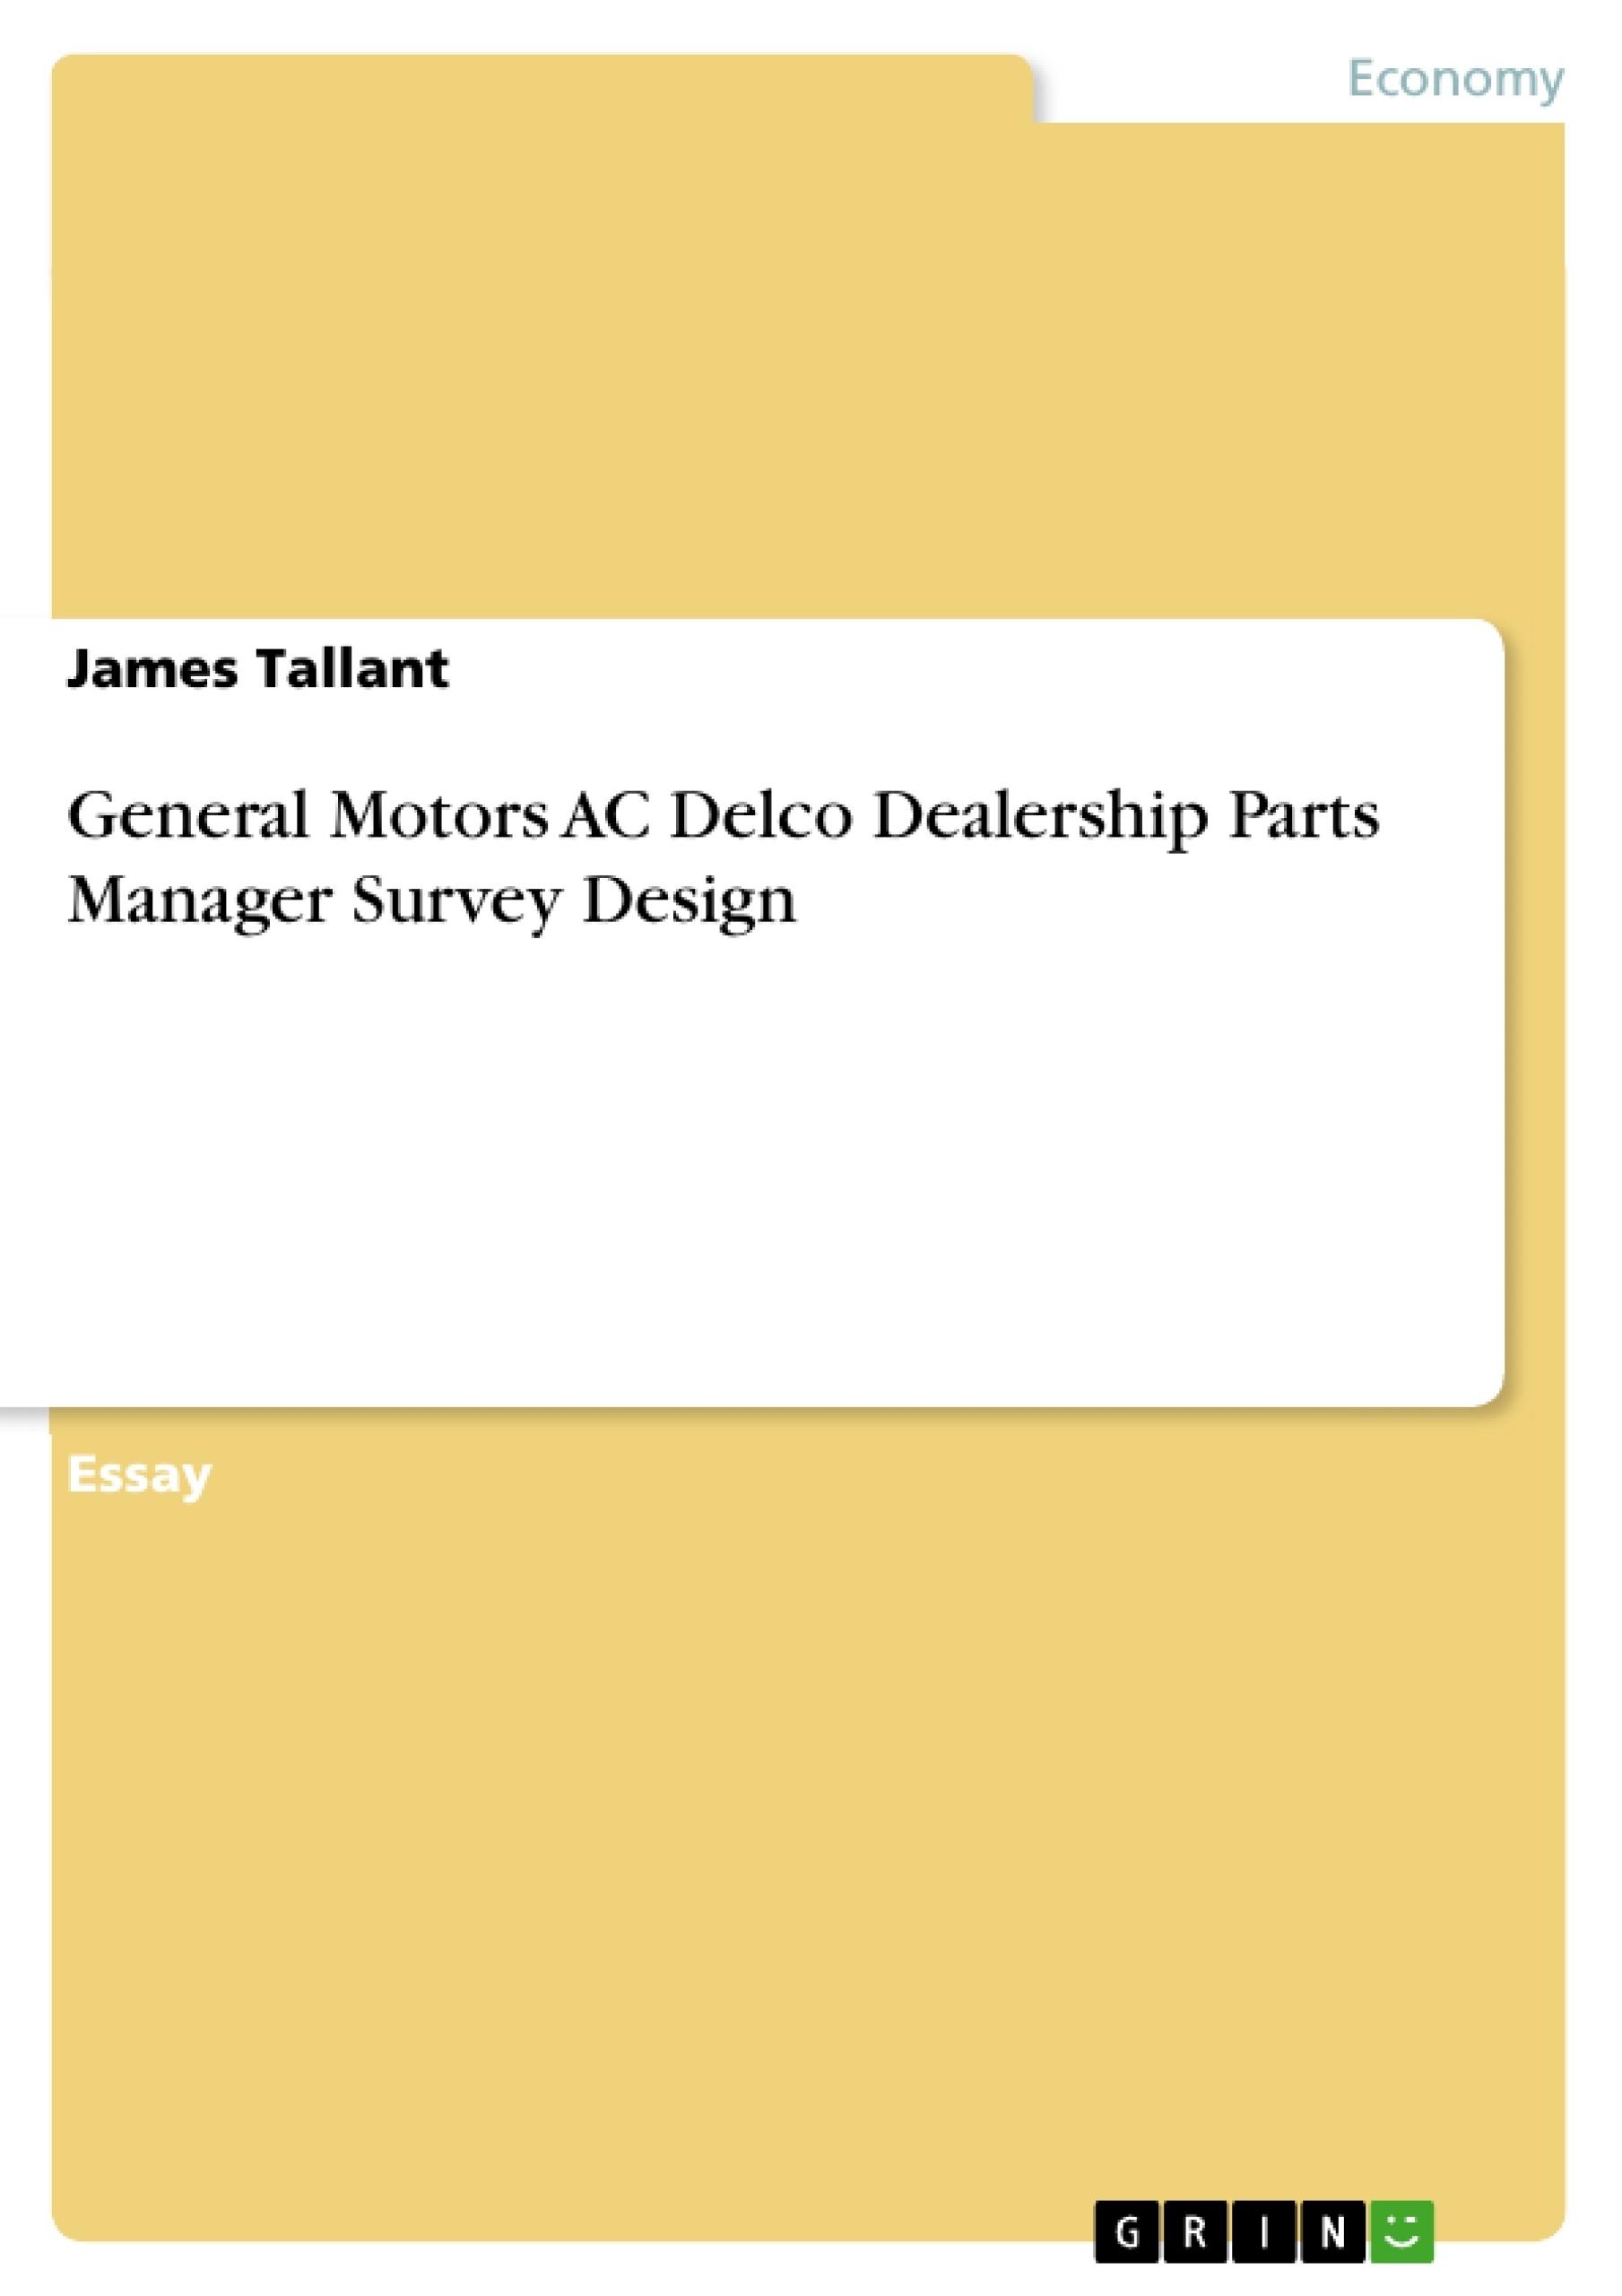 Title: General Motors AC Delco  Dealership Parts Manager Survey Design